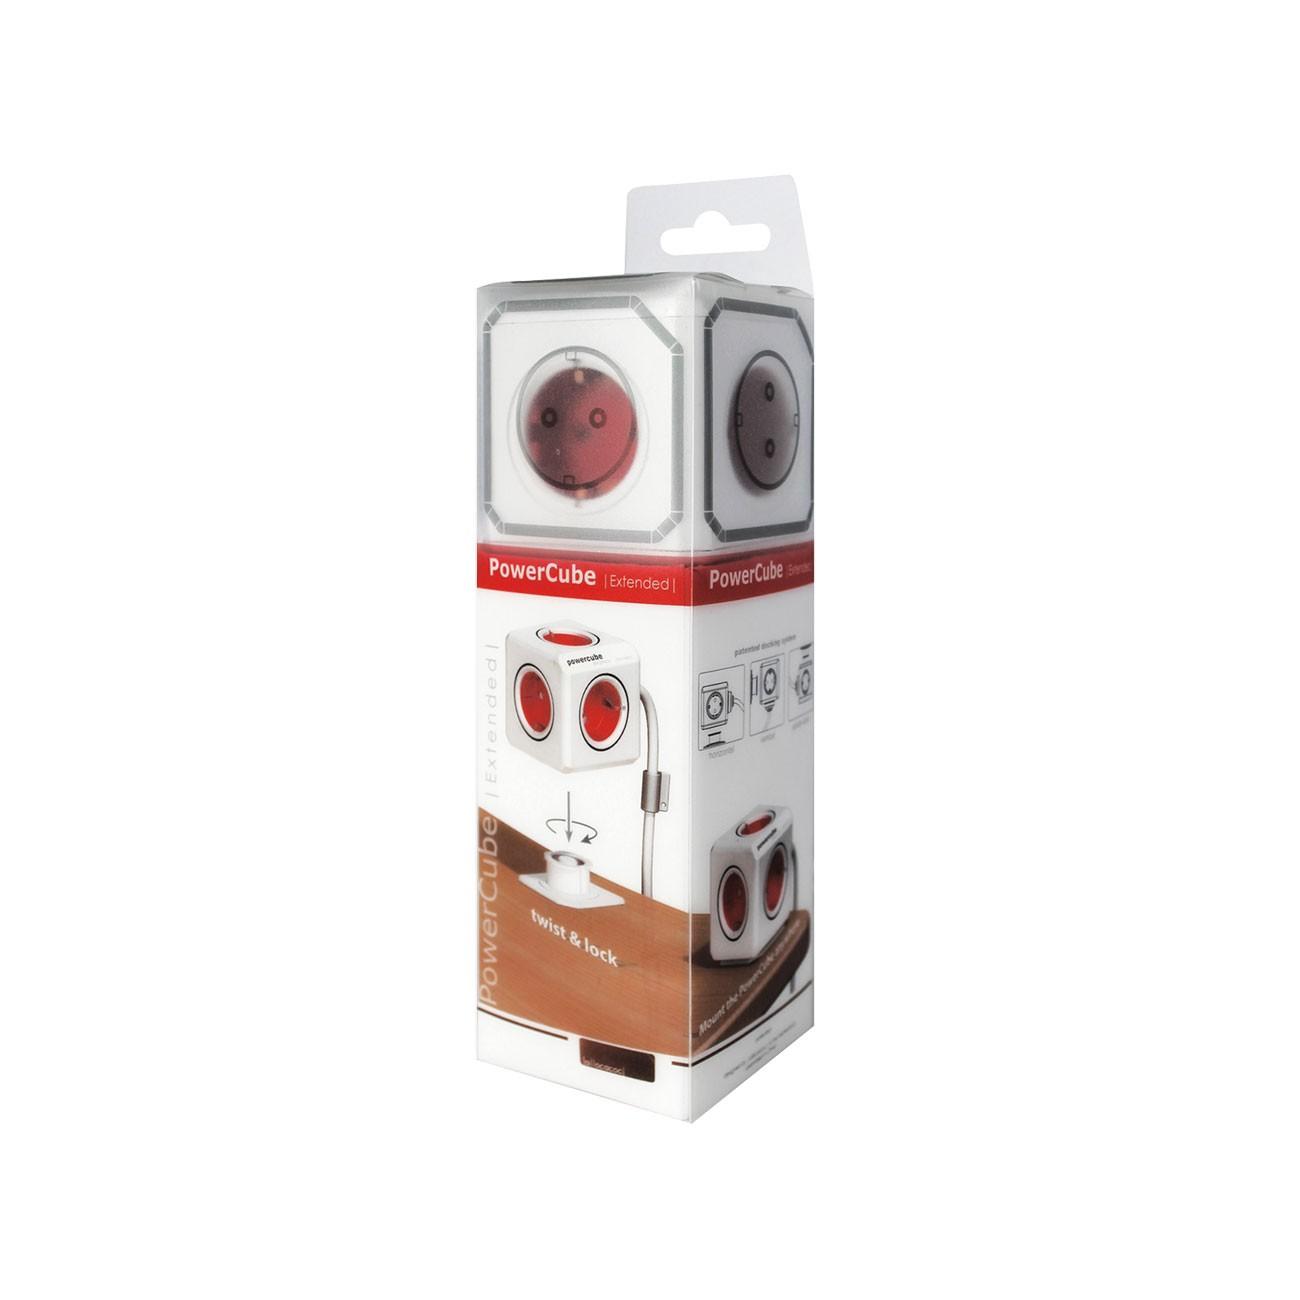 Prelungitor PowerCube 5prize, 3 m